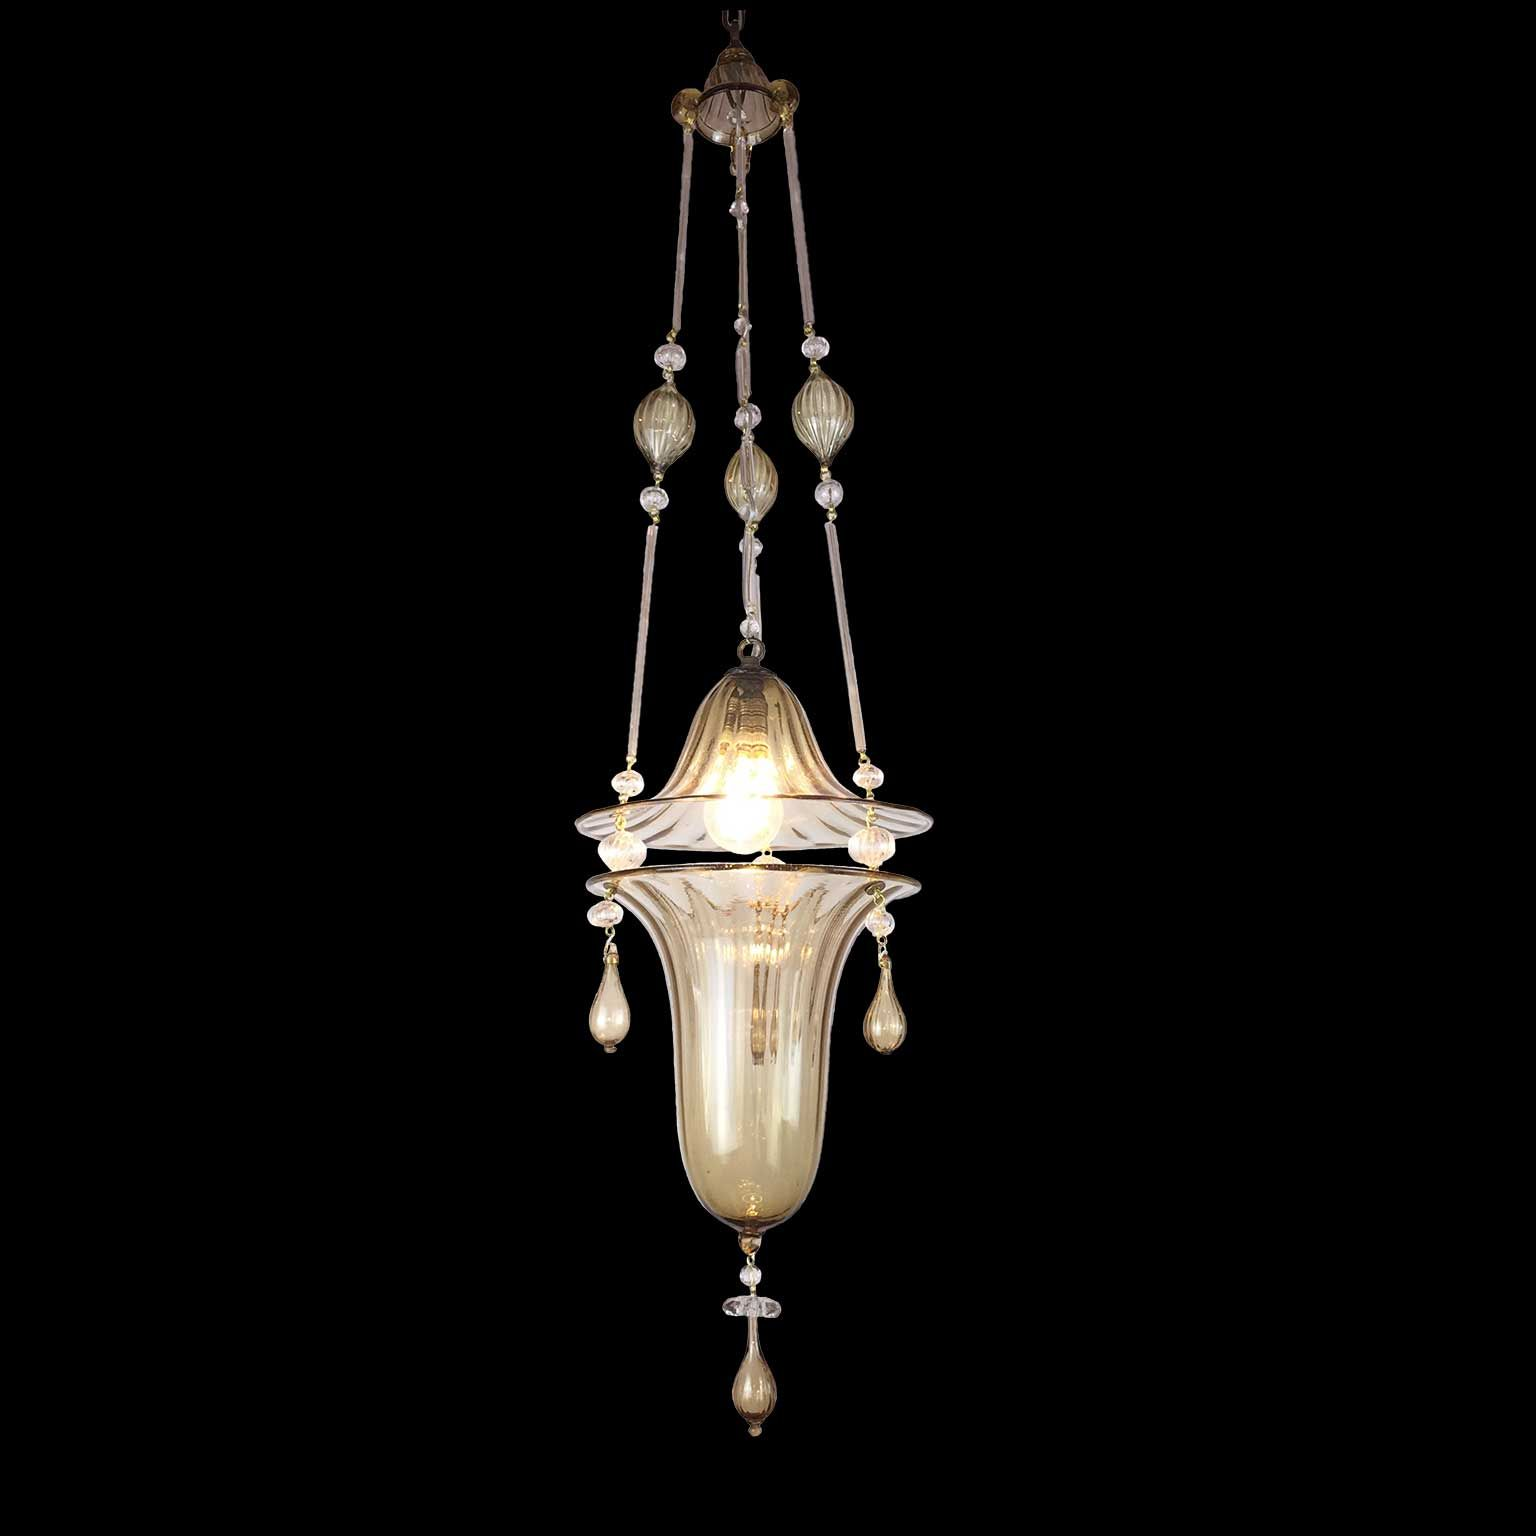 Lampadario in Vetro di Murano Lampadario in vetro